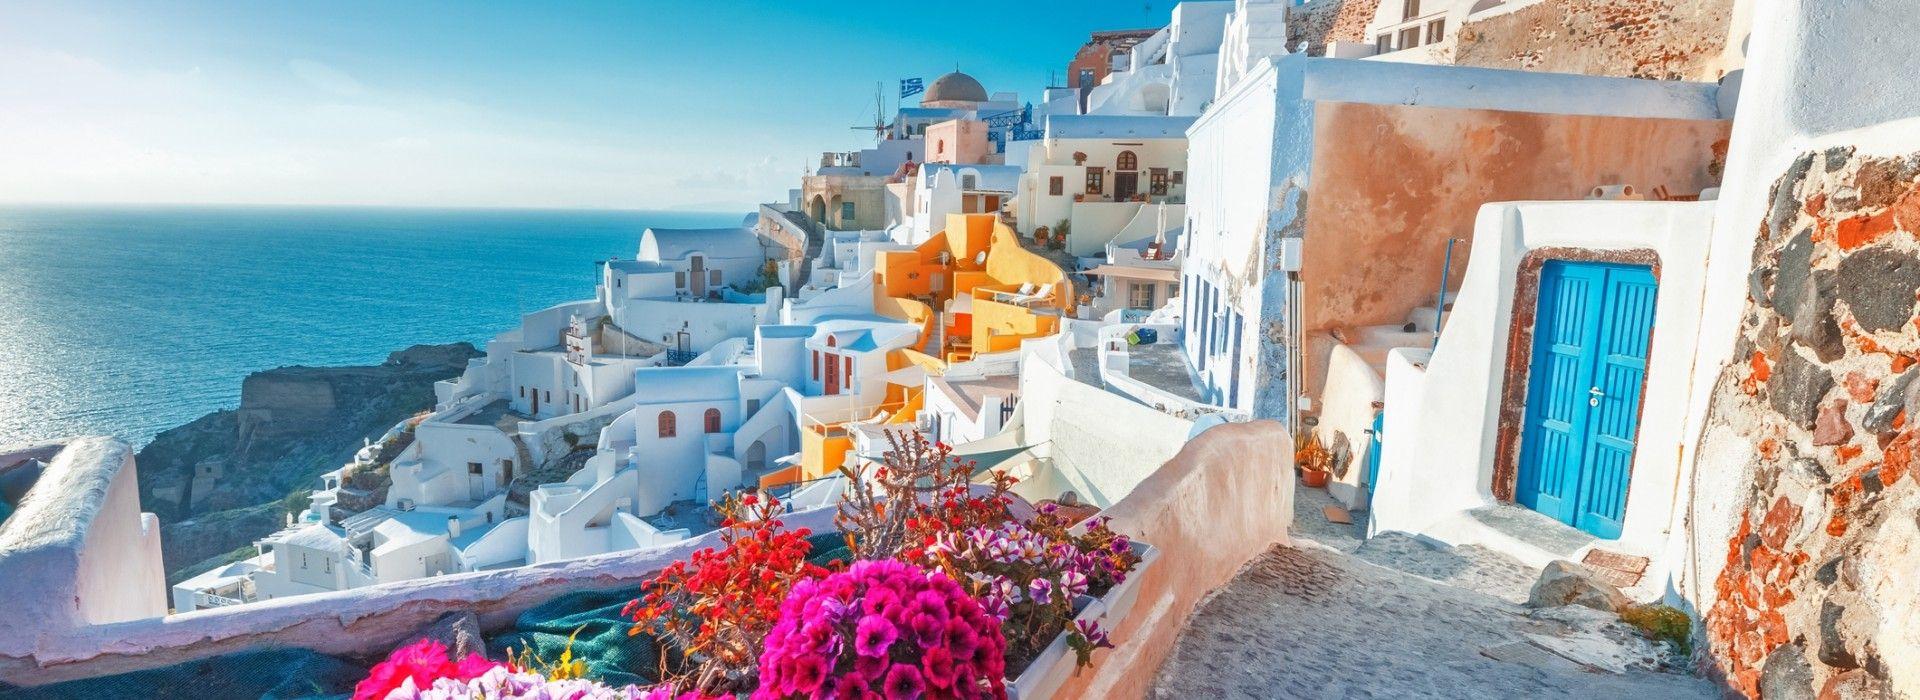 Adventure and sport Tours in Mediterranean